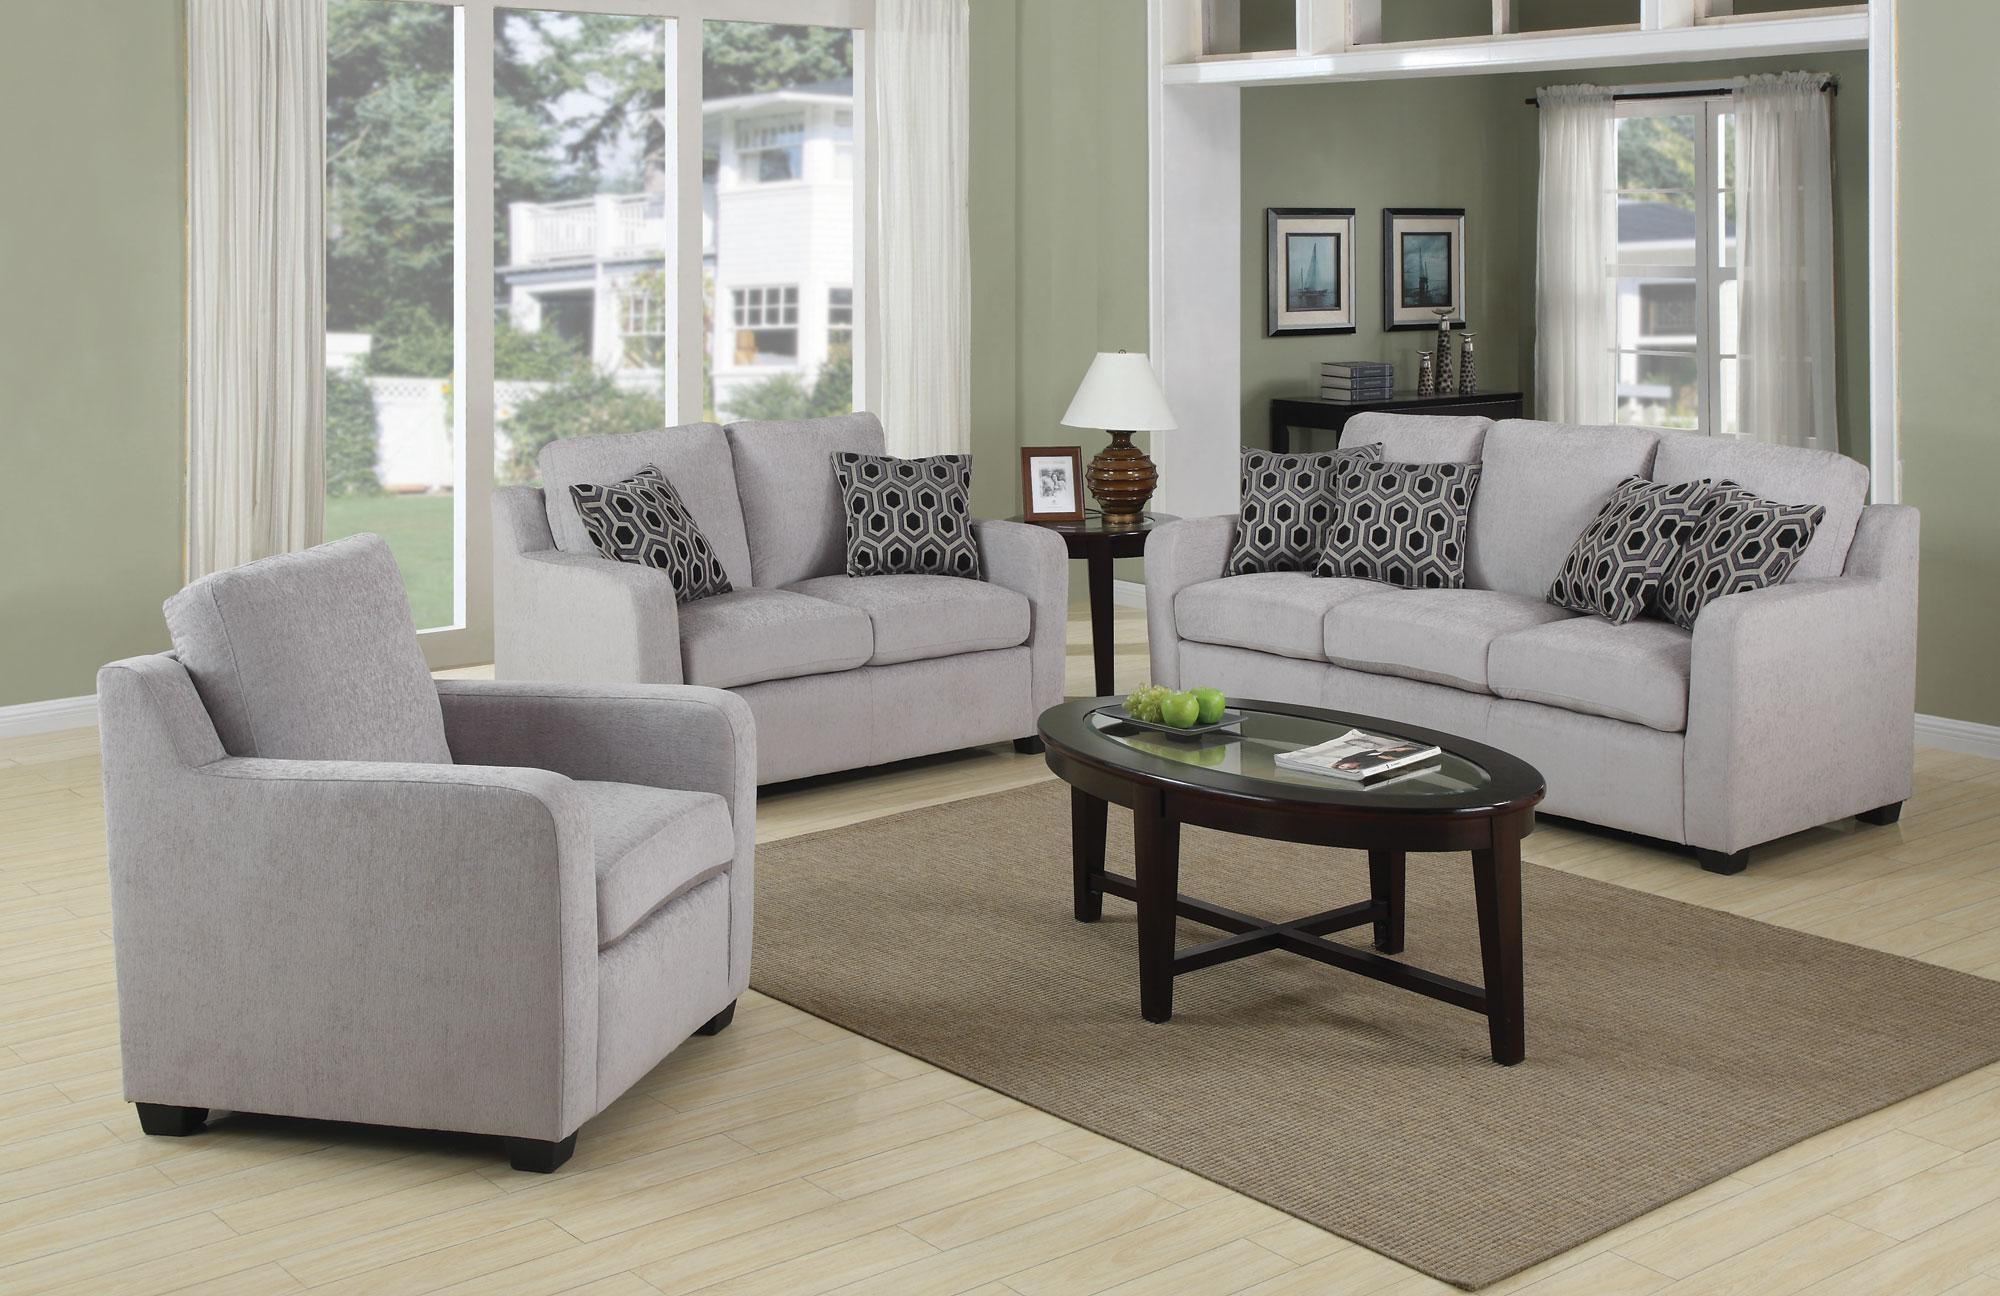 Blue Gray Sofa | Sofa Gallery | Kengire Regarding Blue Gray Sofas (Image 2 of 20)